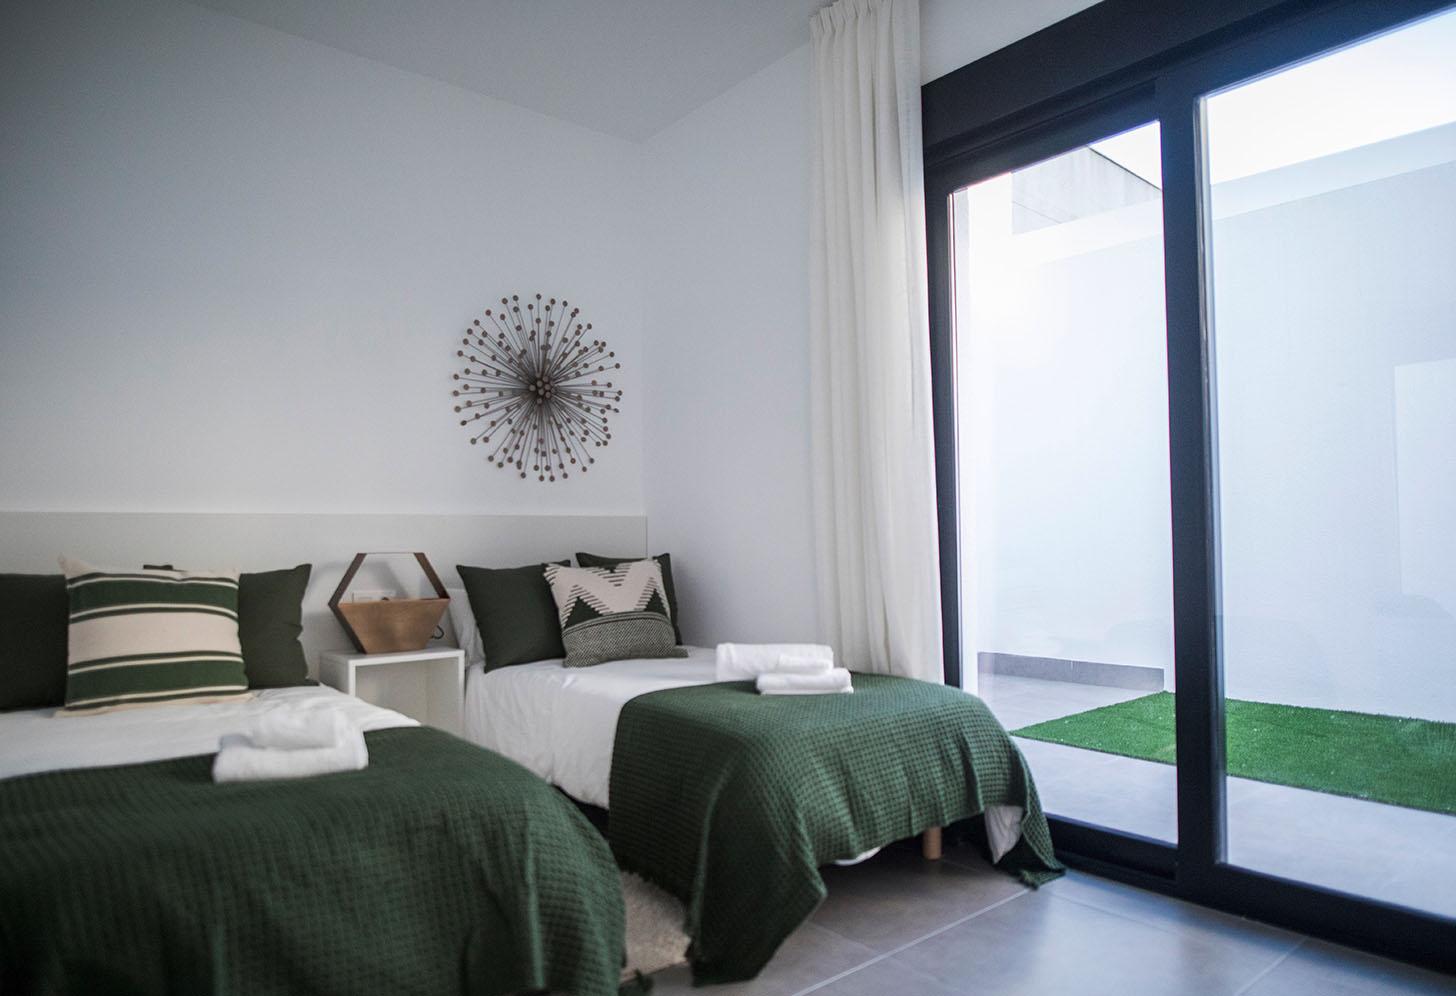 immobilier neuf espagne costa blanca sur murcia chambre 3